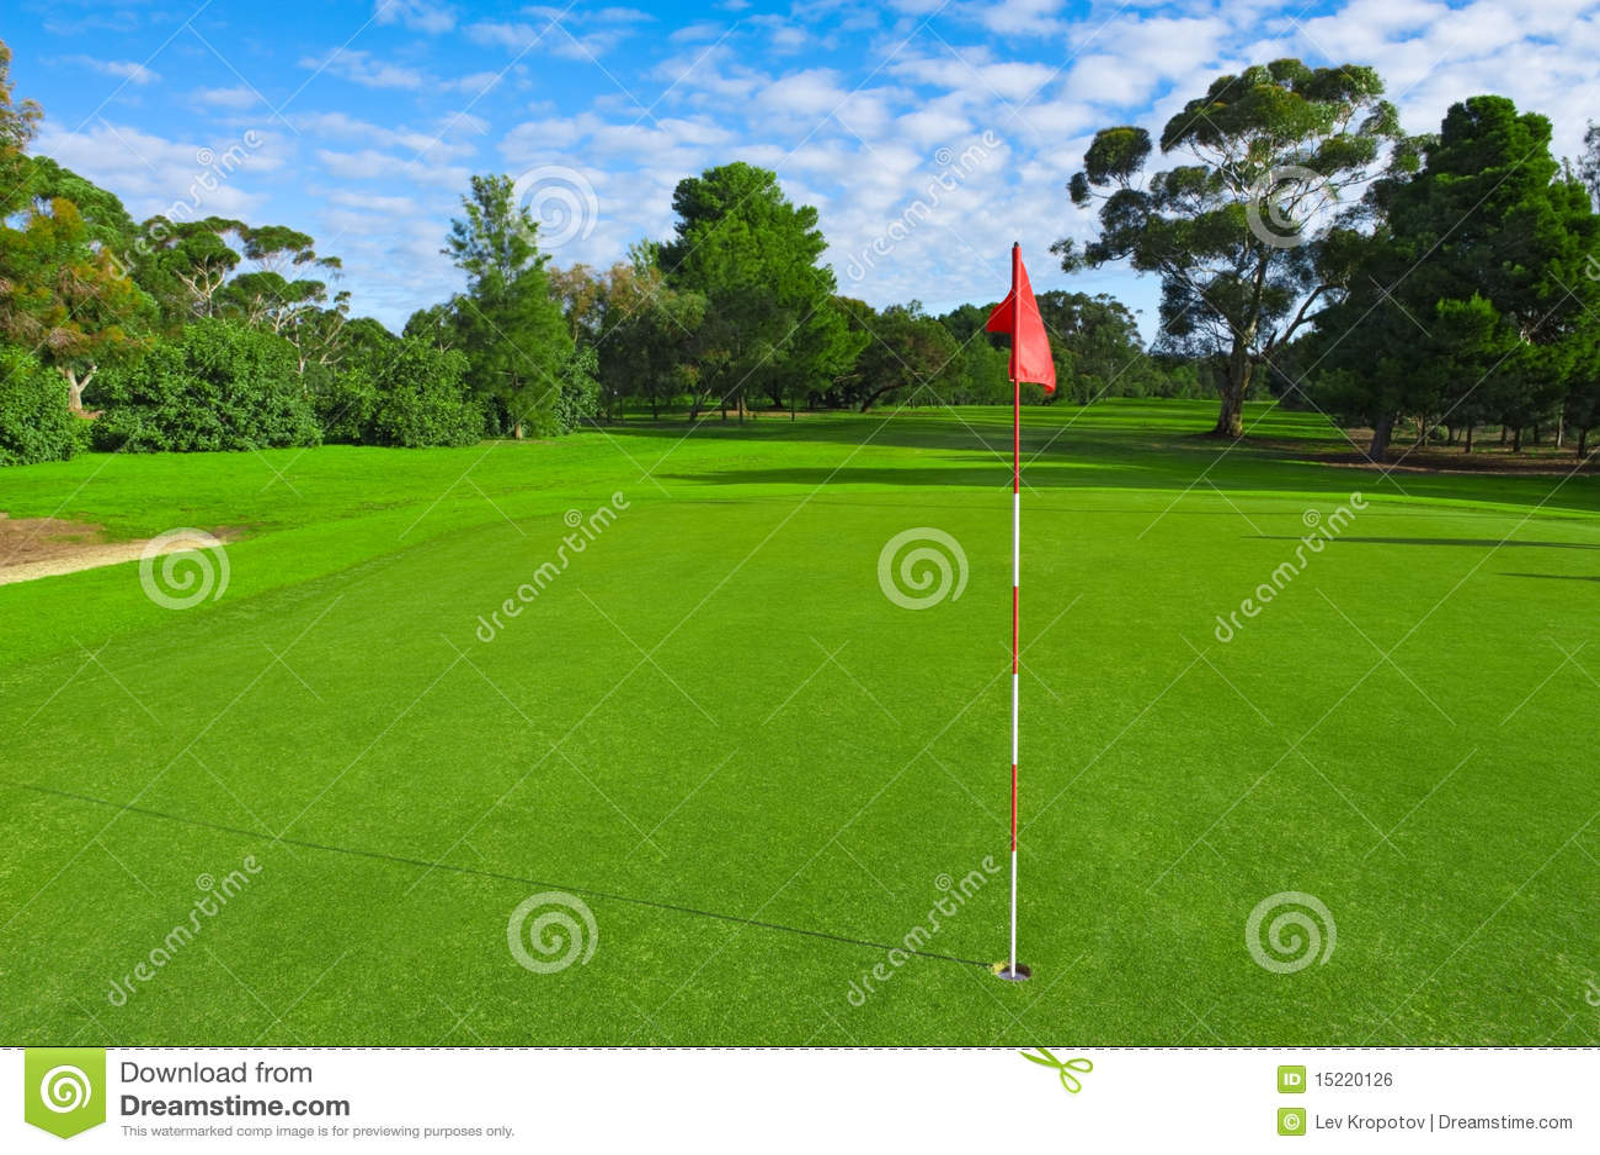 horizontal d 39 une zone verte de golf photo stock image du ressort outdoors 15220126. Black Bedroom Furniture Sets. Home Design Ideas